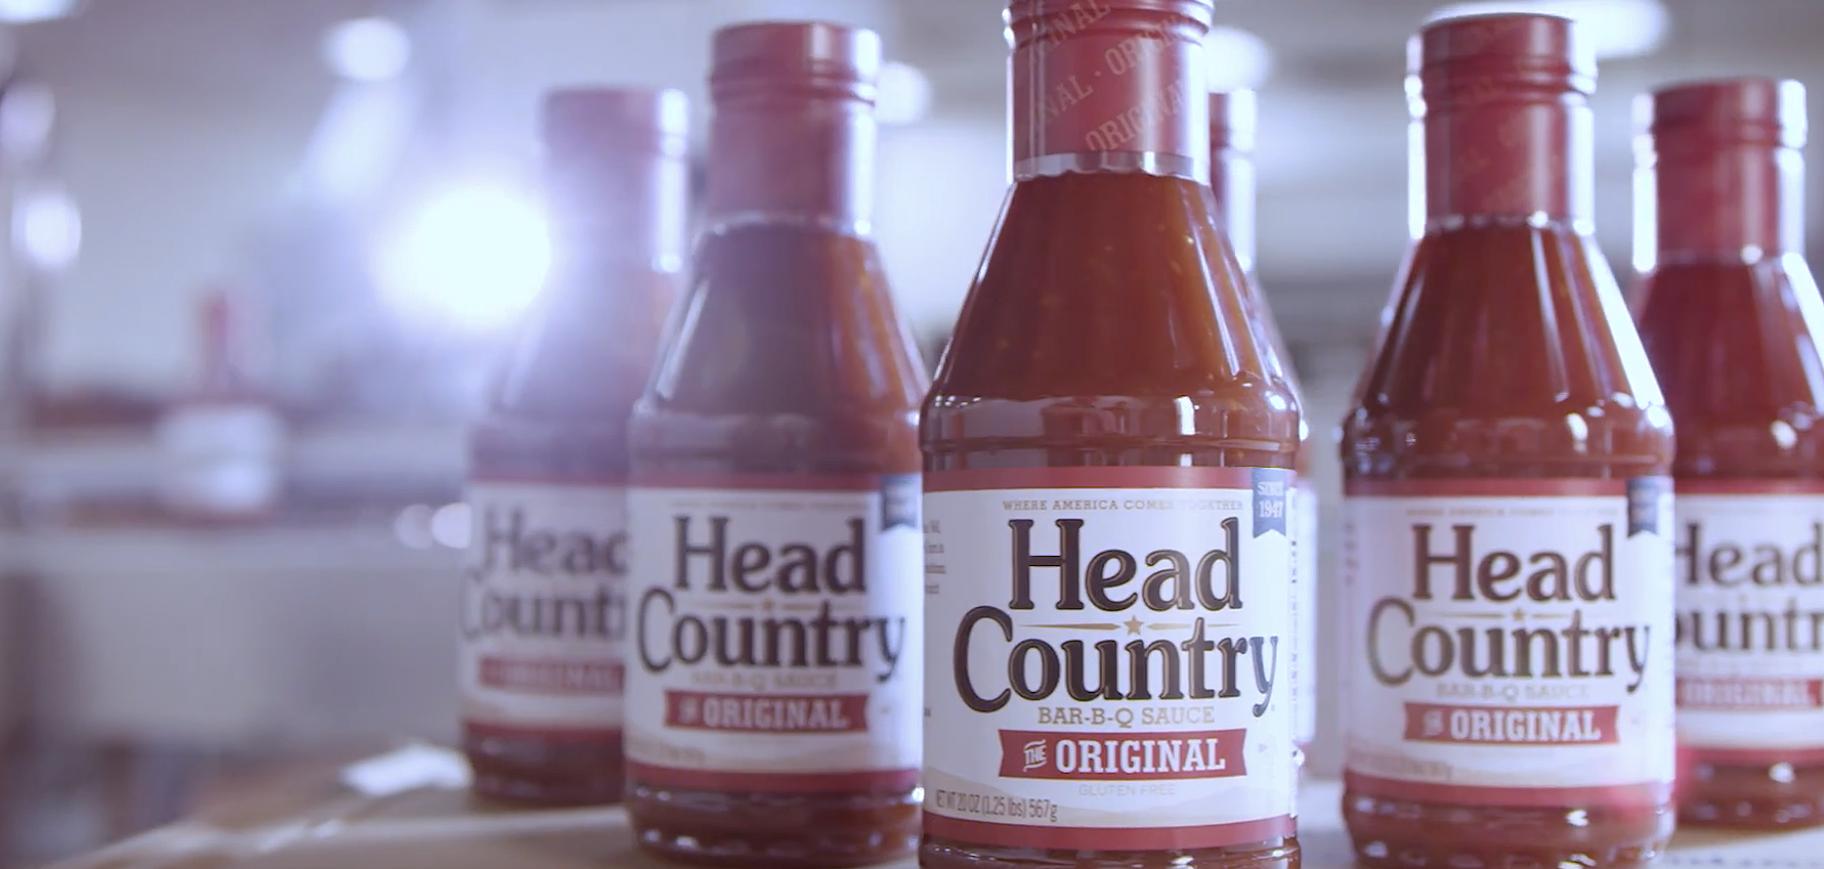 CAREER TECH HEAD COUNTRY BBQ SAUCE -